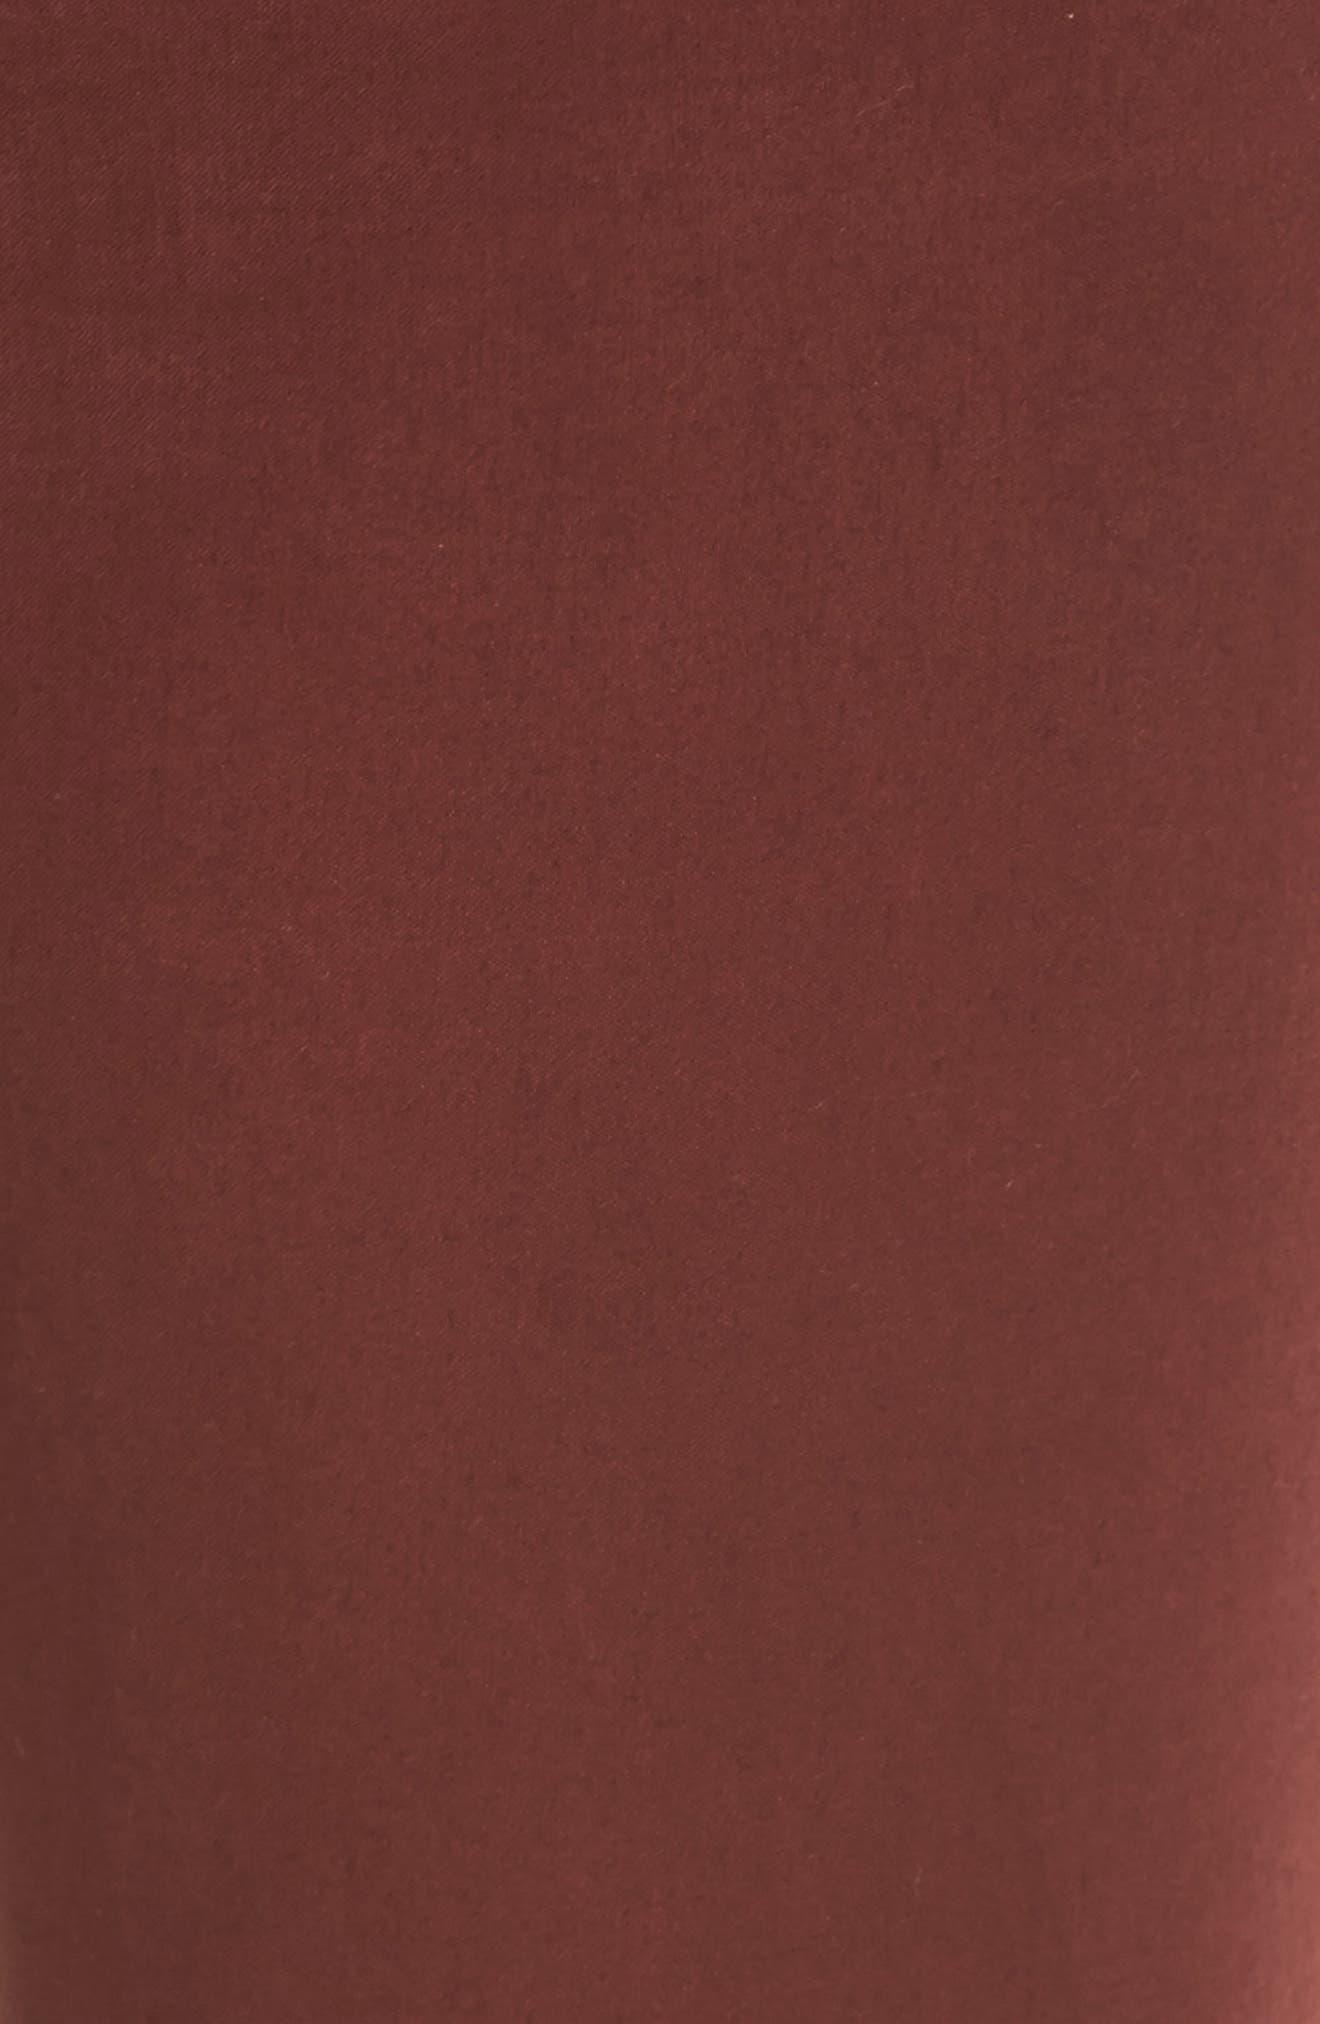 Sateen Skinny Ankle Jeans,                             Alternate thumbnail 5, color,                             201